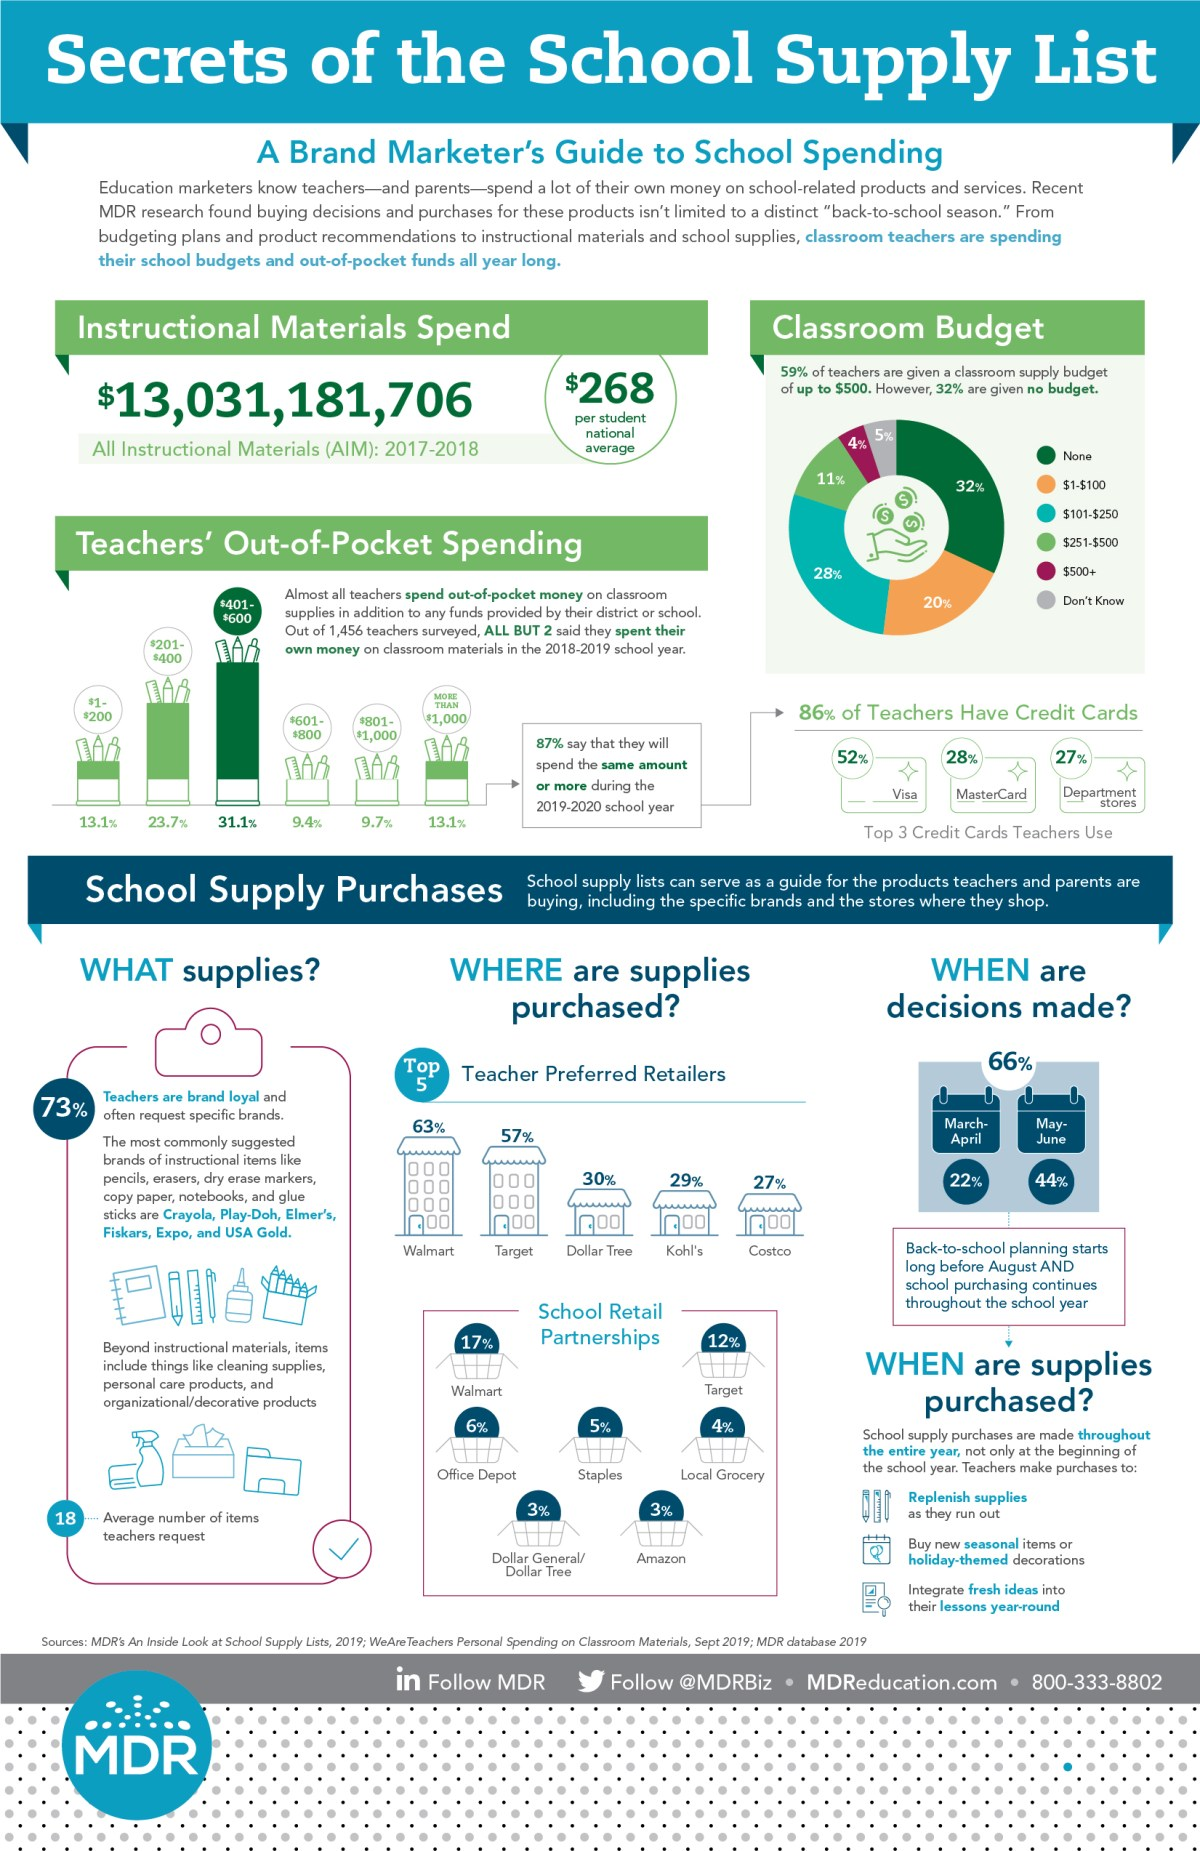 Secrets of the School Supplu List Infographic